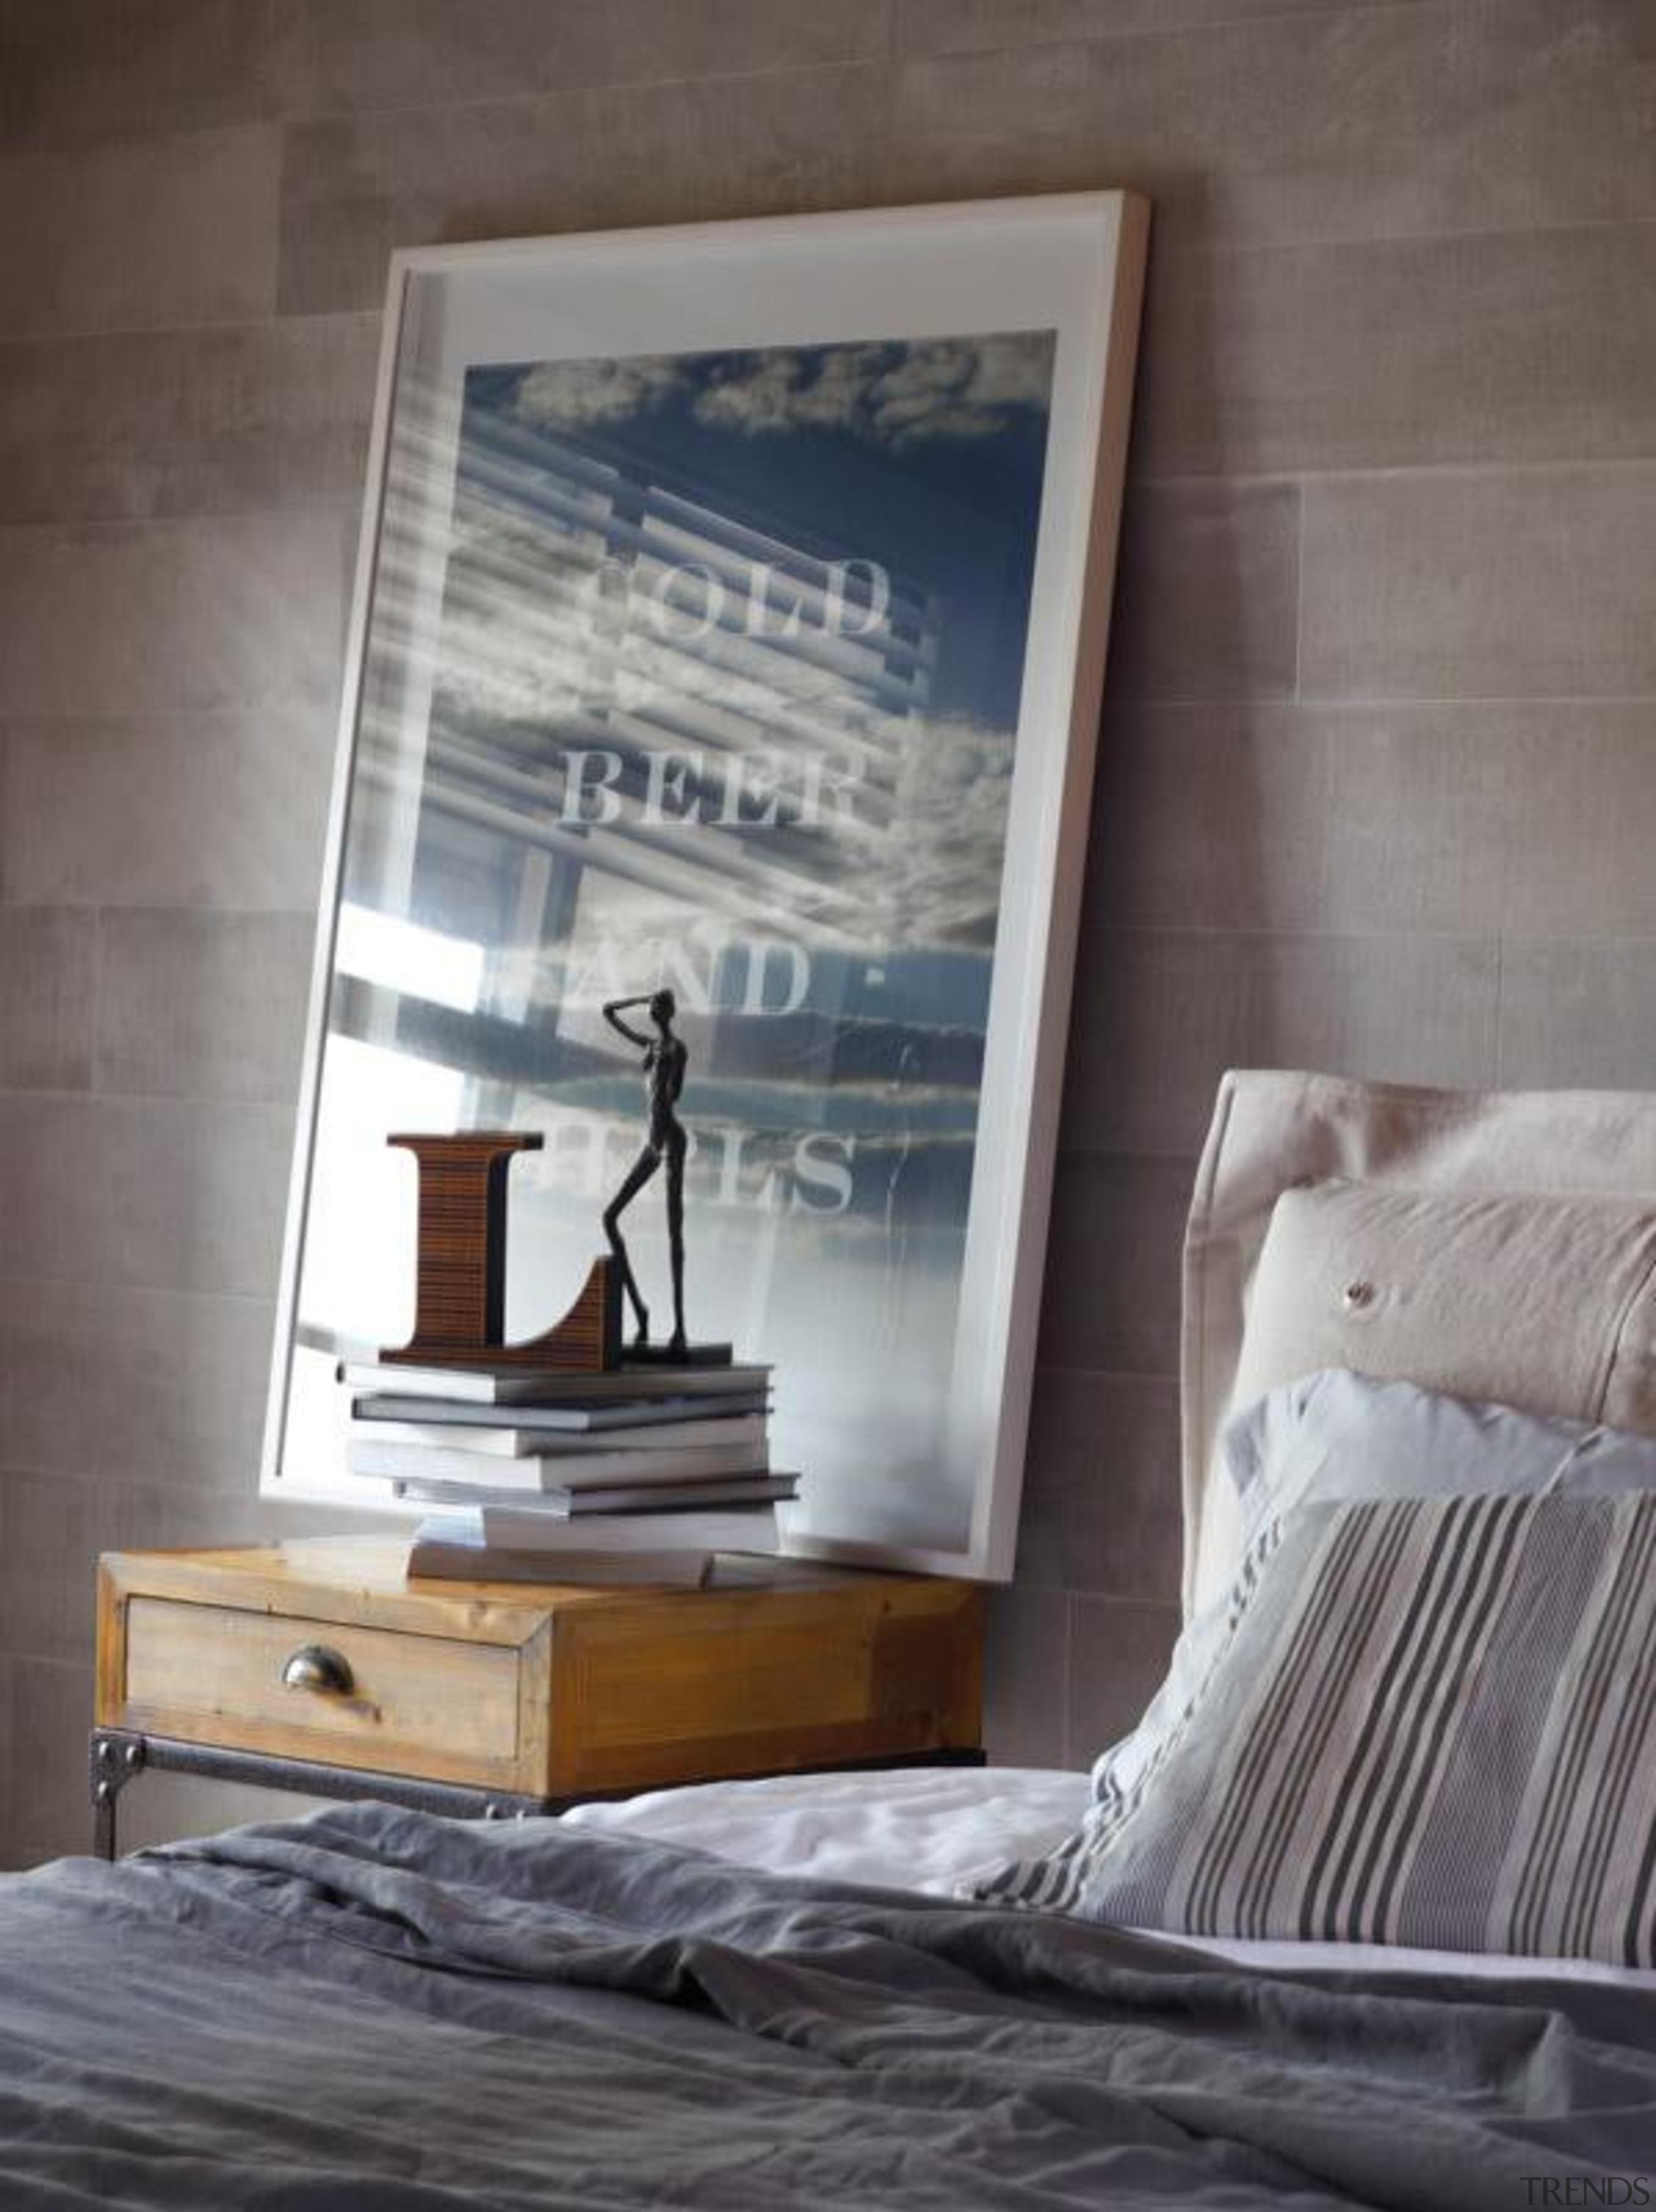 Concreto Cinza 200x1200mm - Concreto Cinza 200x1200mm - furniture, home, interior design, room, wall, window, wood, gray